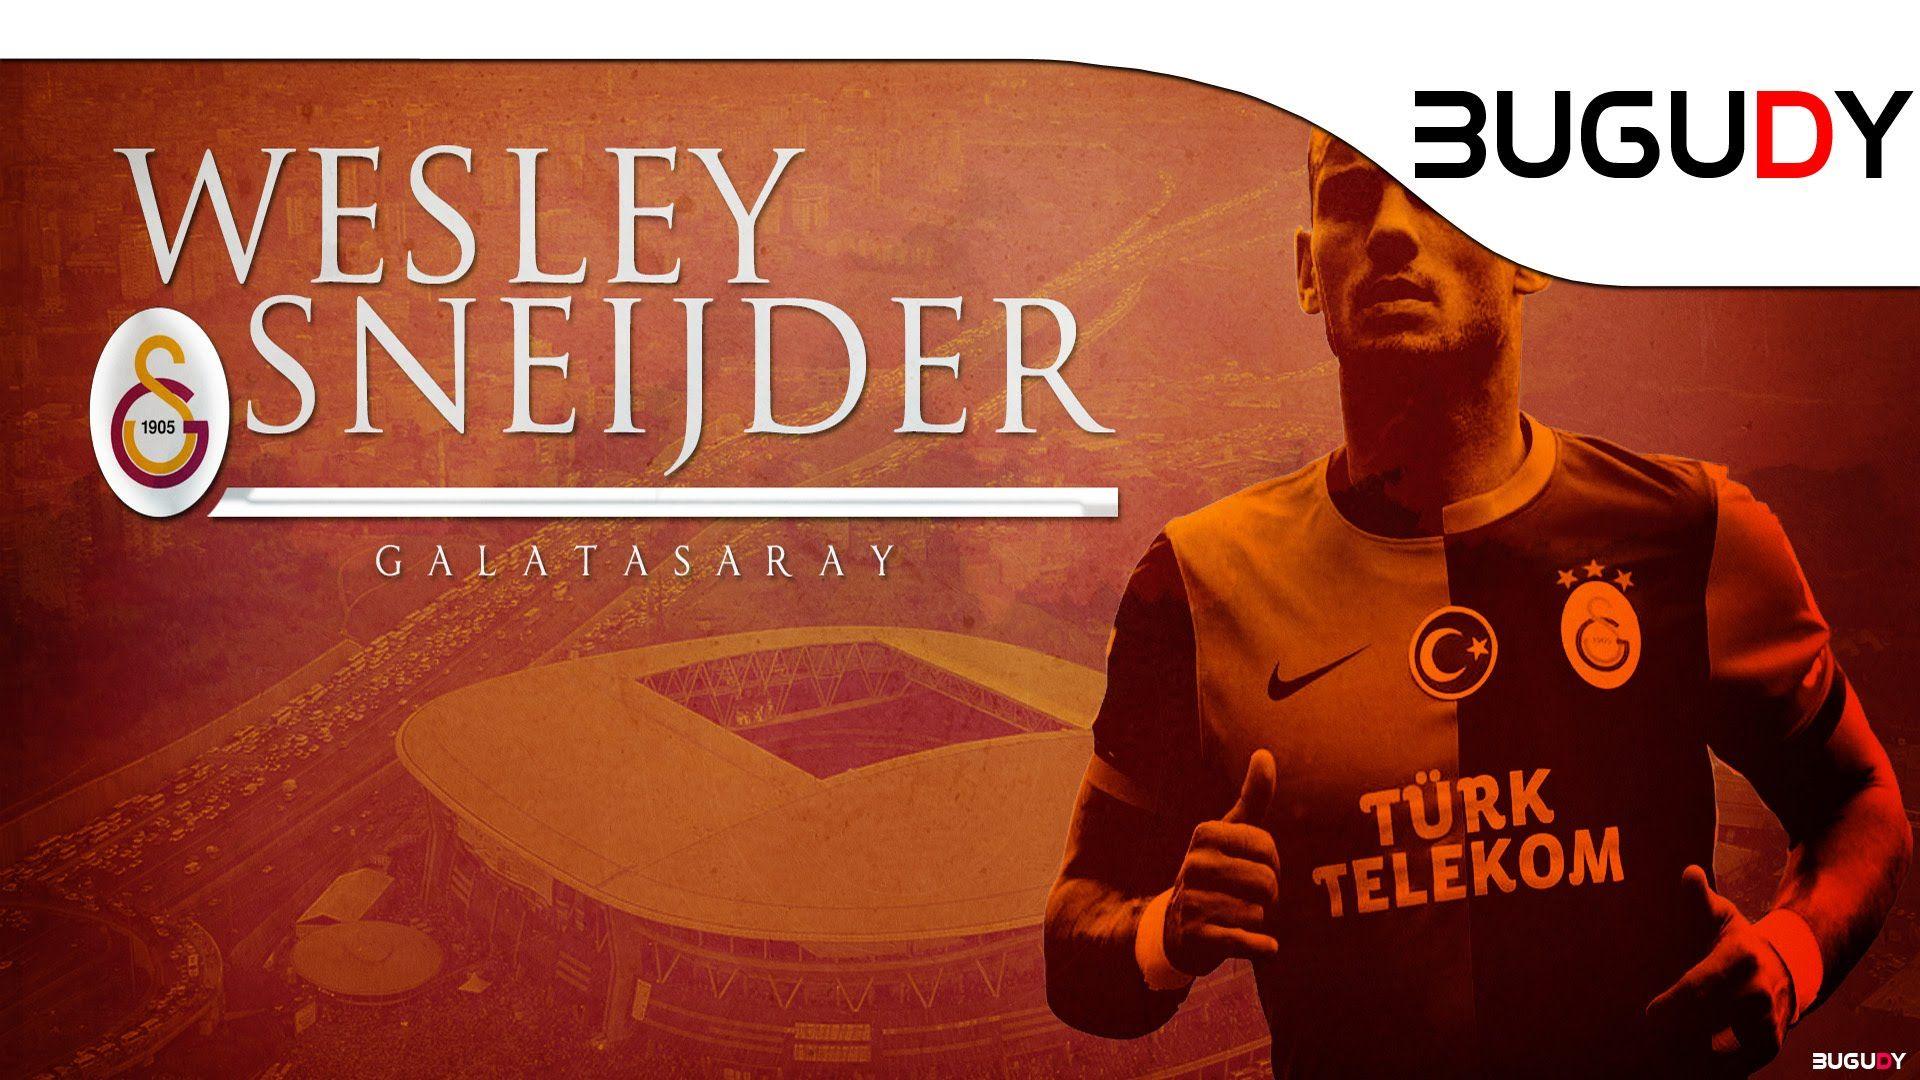 Galatasaray Şarkı 2015 Dubstep Remix - Re Re Re Ra Ra Ra